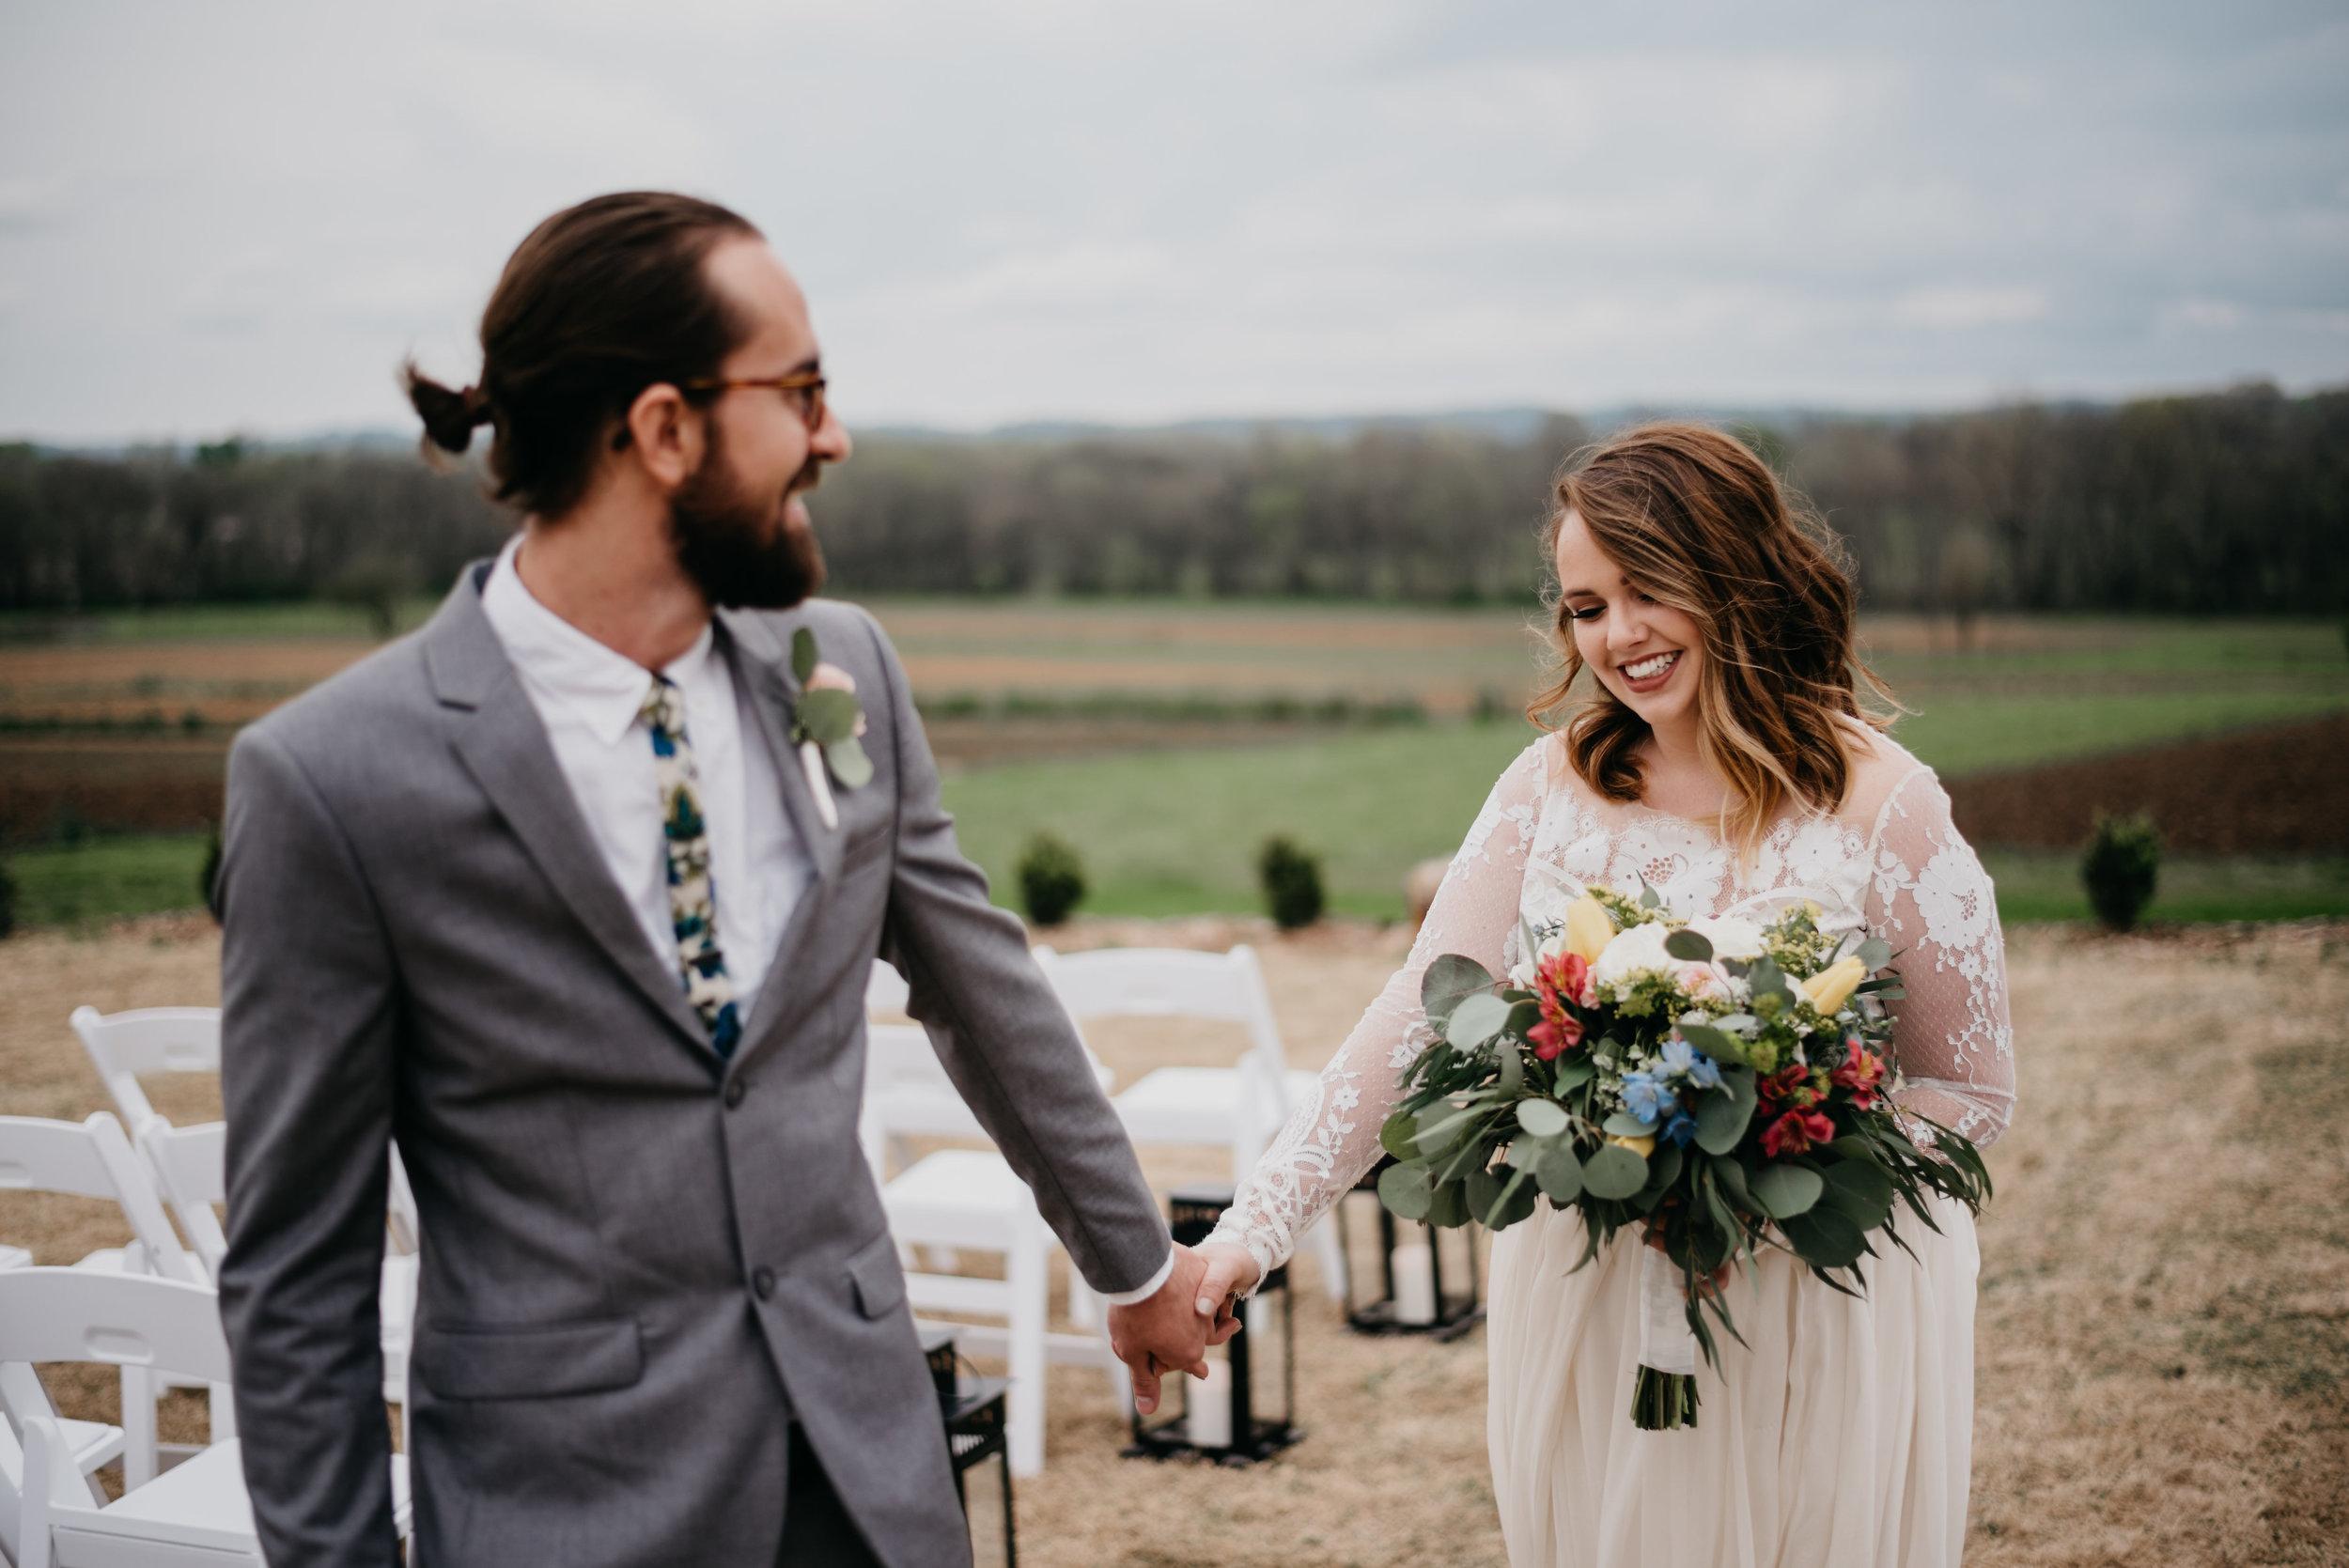 Allenbrooke-Farms-Nashville-Wedding-Photographers 8.jpg